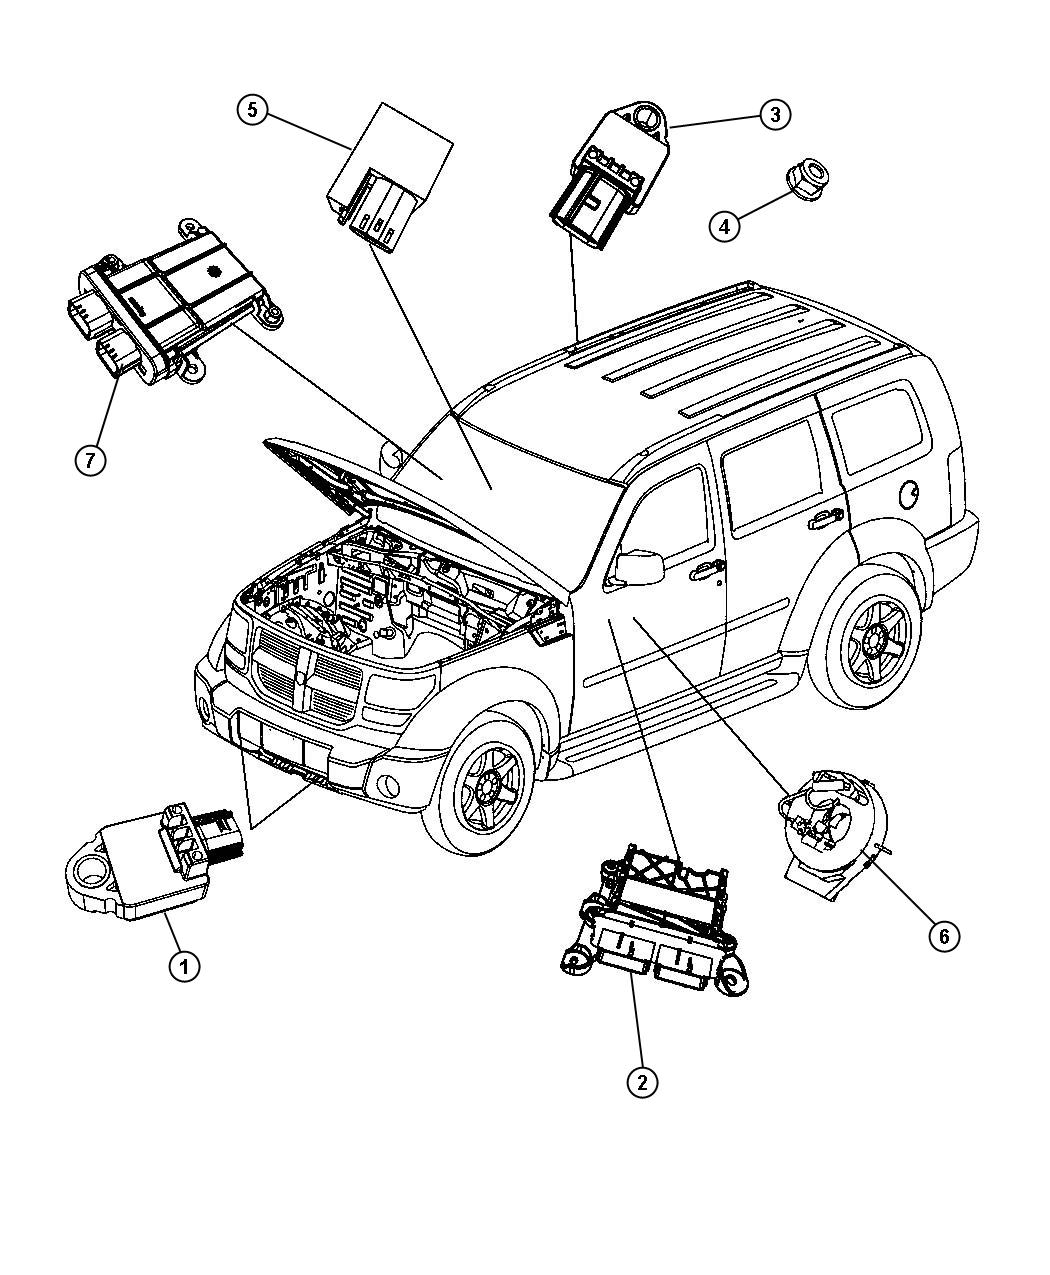 Jeep Liberty Module. Occupant restraint. Export. [egypt